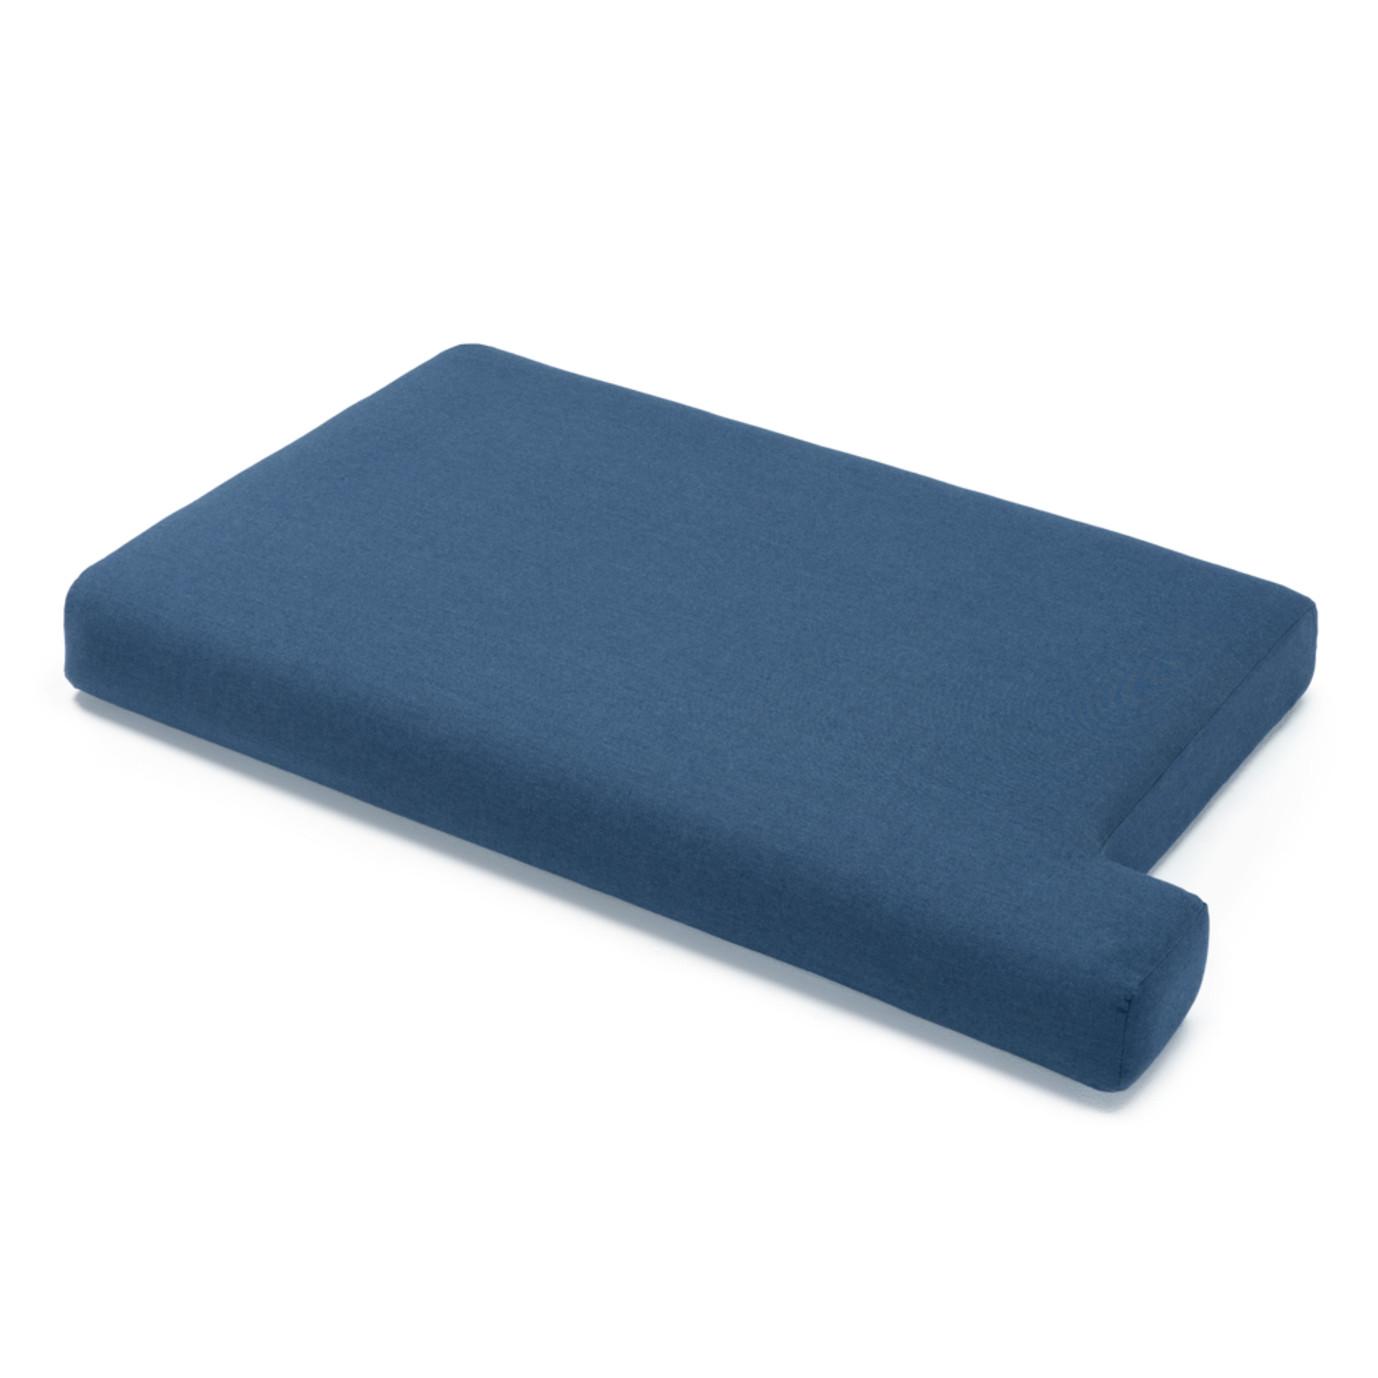 Portofino Comfort 88in Sofa Left Base Cushion - Laguna Blue